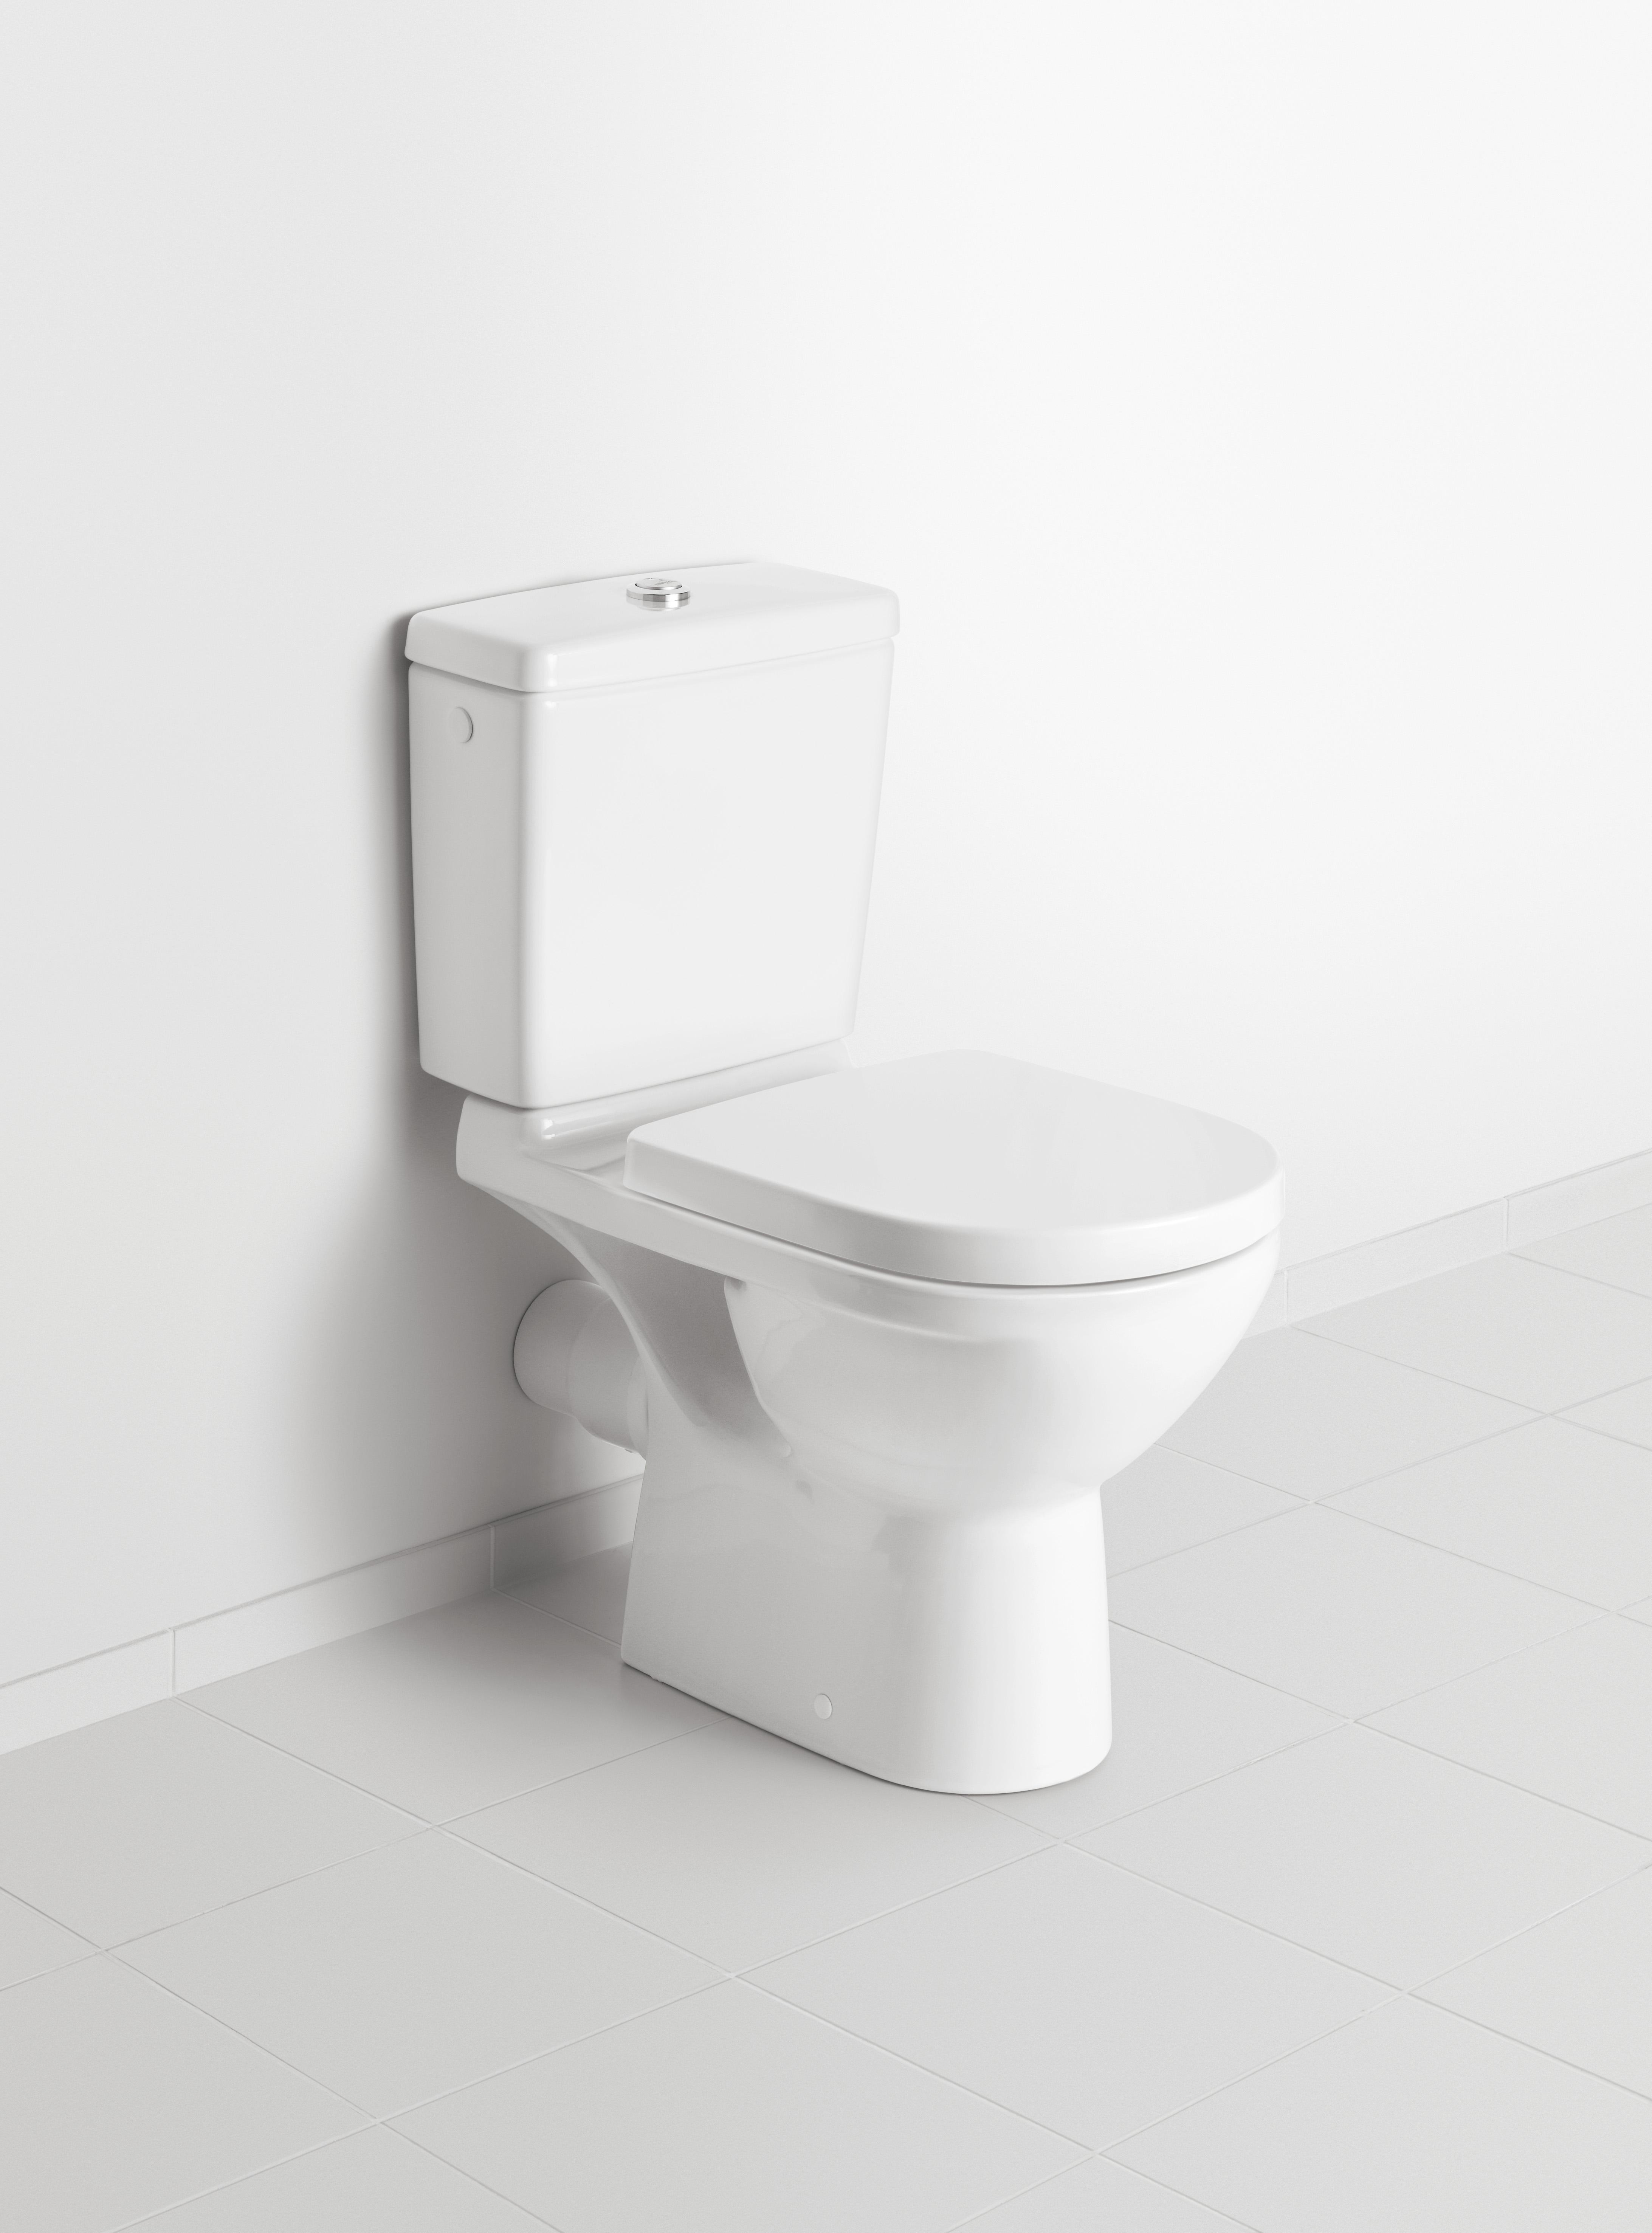 O.novo Los inodoros, Inodoros con cisterna de pie, Inodoros, Inodoro de fondo profundo